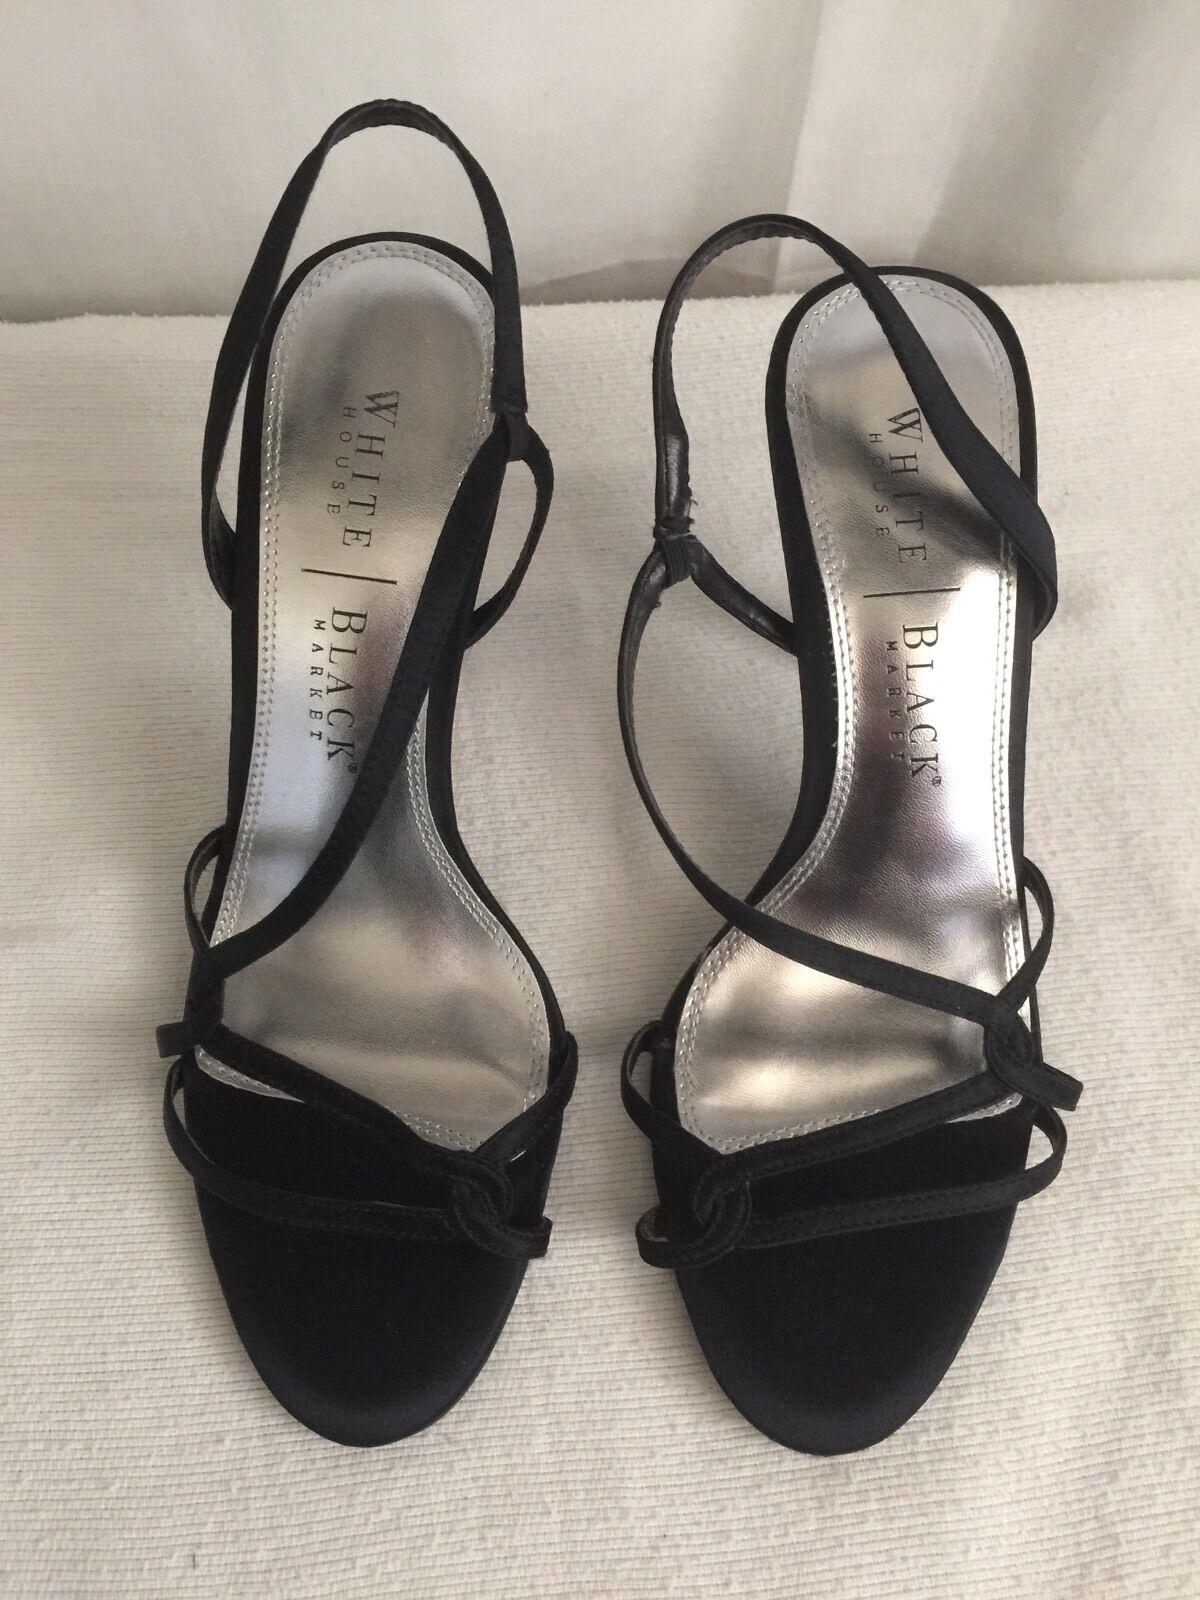 white house black market Black Strappy Sandals  Amelia Size 6.5M